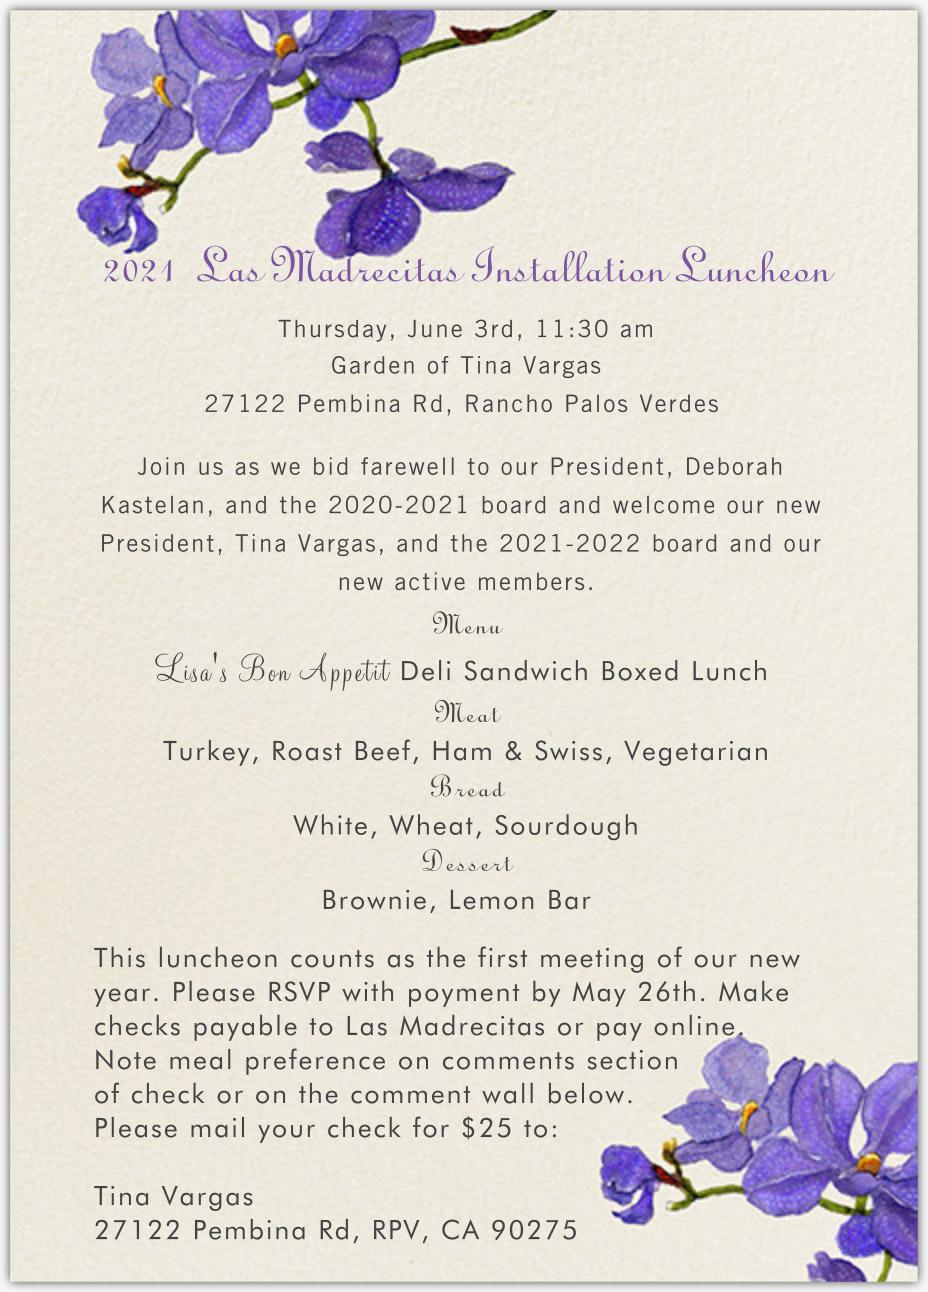 invitation Las Madrecitas 2021-2022 Installation Luncheon